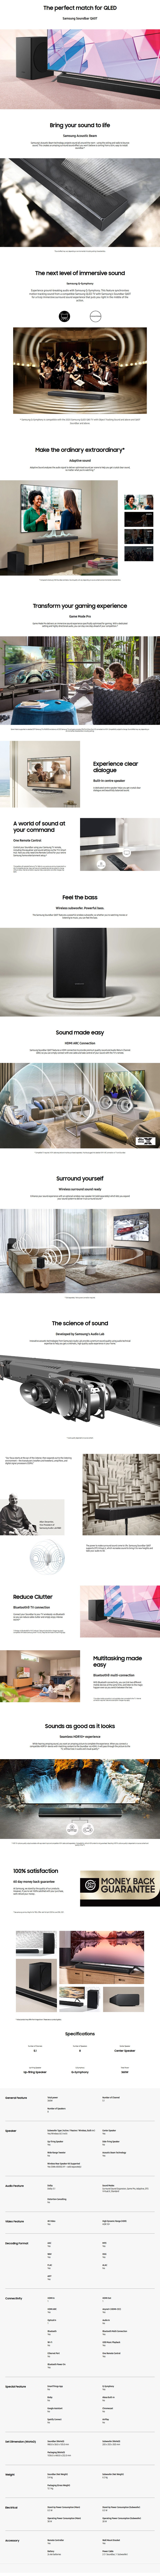 Samsung HW-Q60T 5.1ch Soundbar - Overview 1